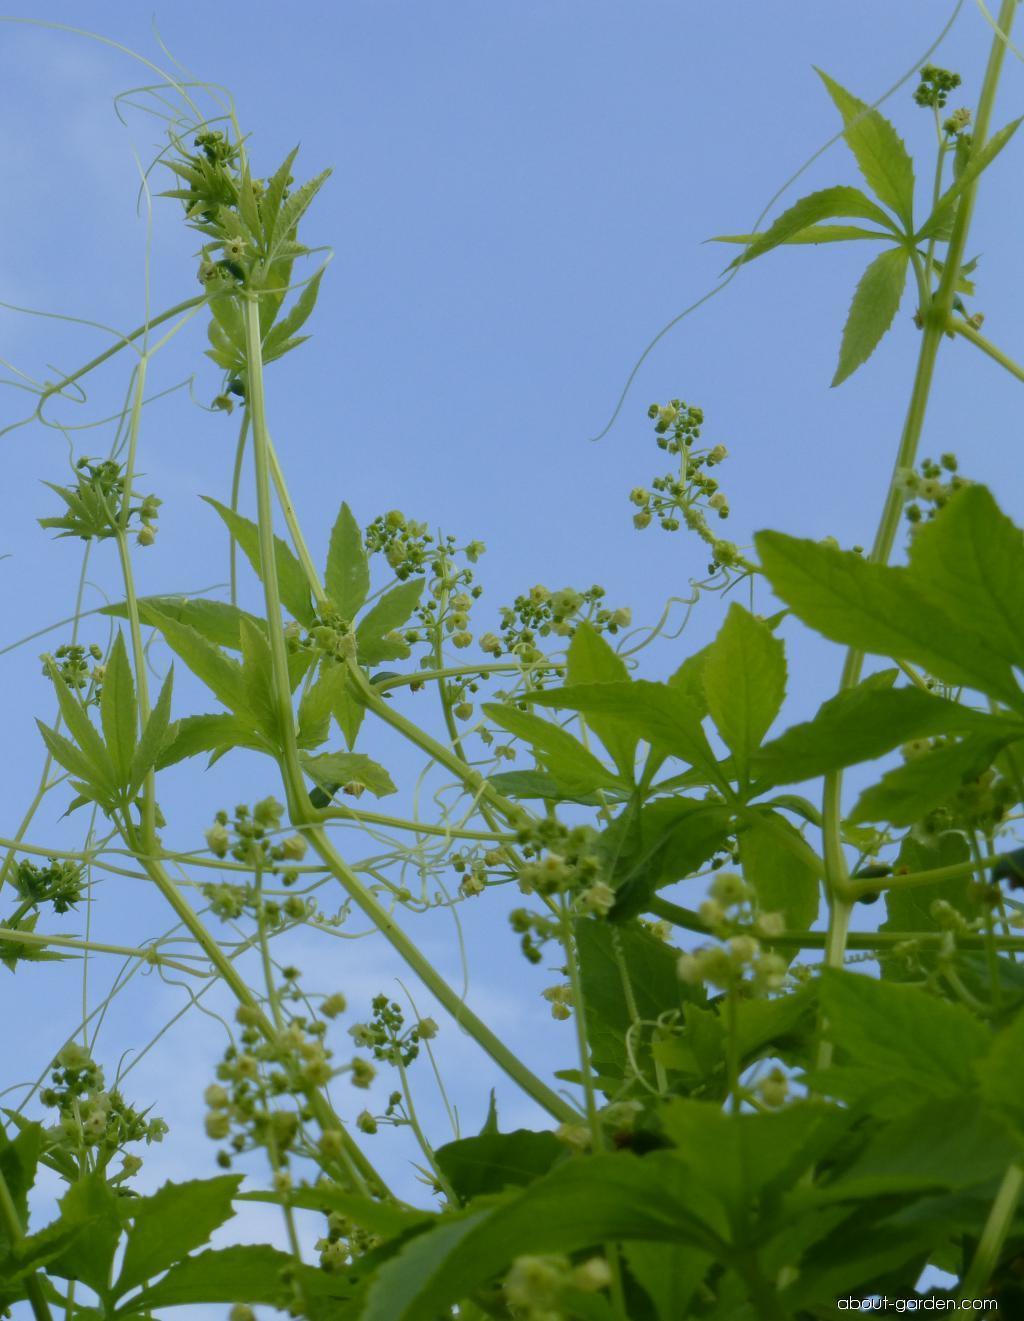 Ačokča (Cyclanthera pedata)